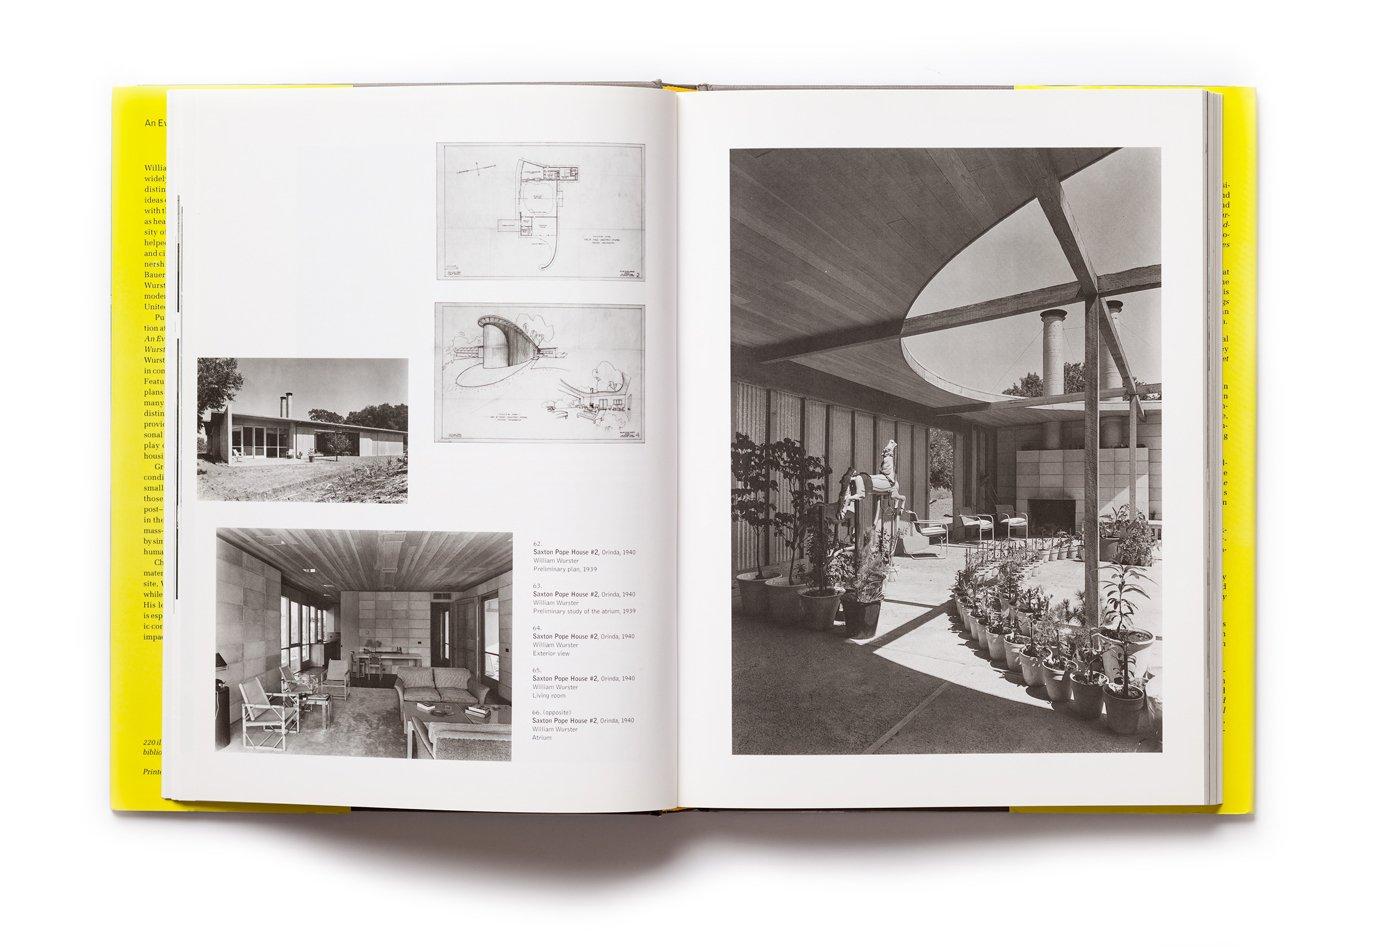 An Everyday Modernism, plates 62-66